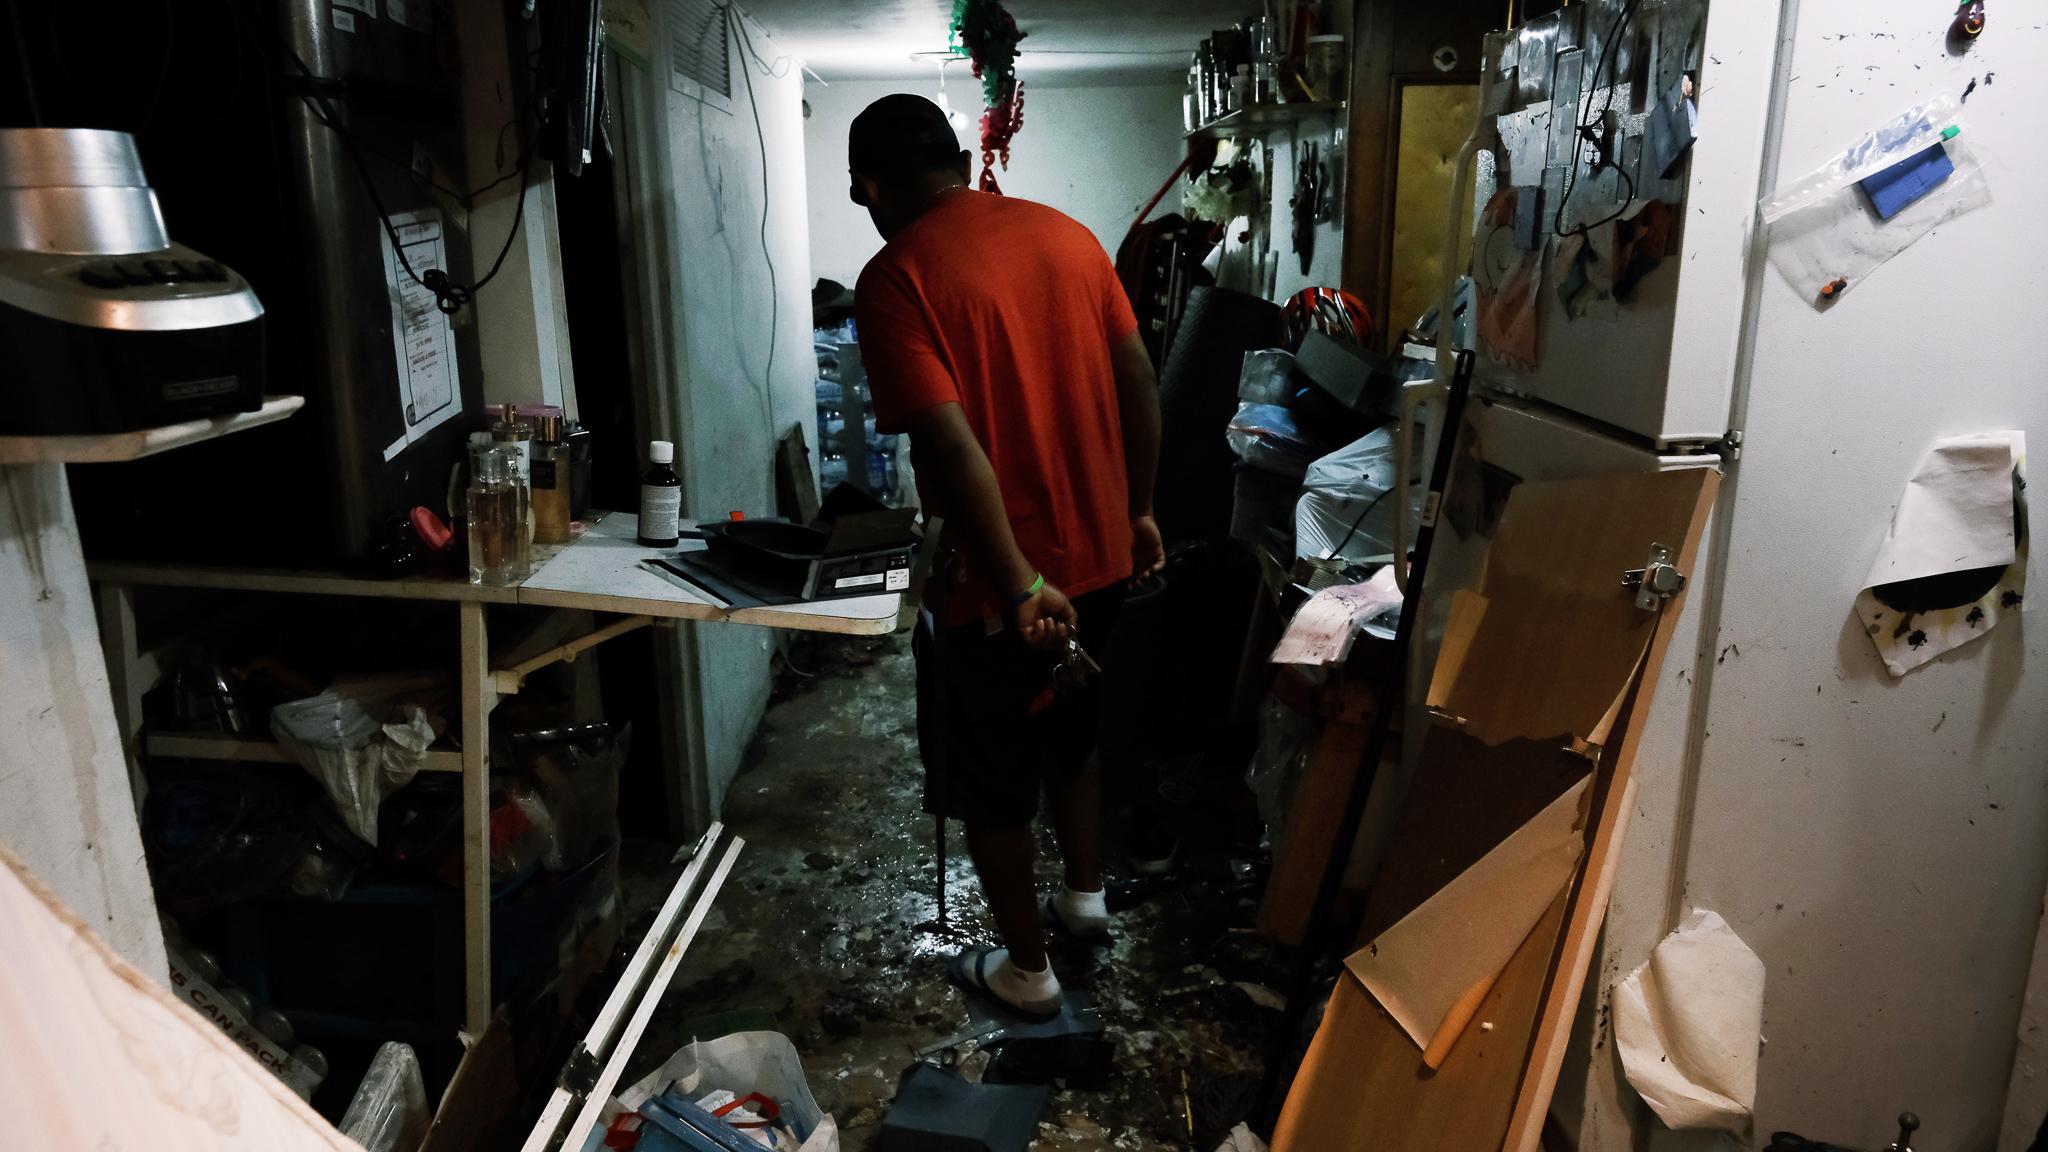 Illegal basement apartments